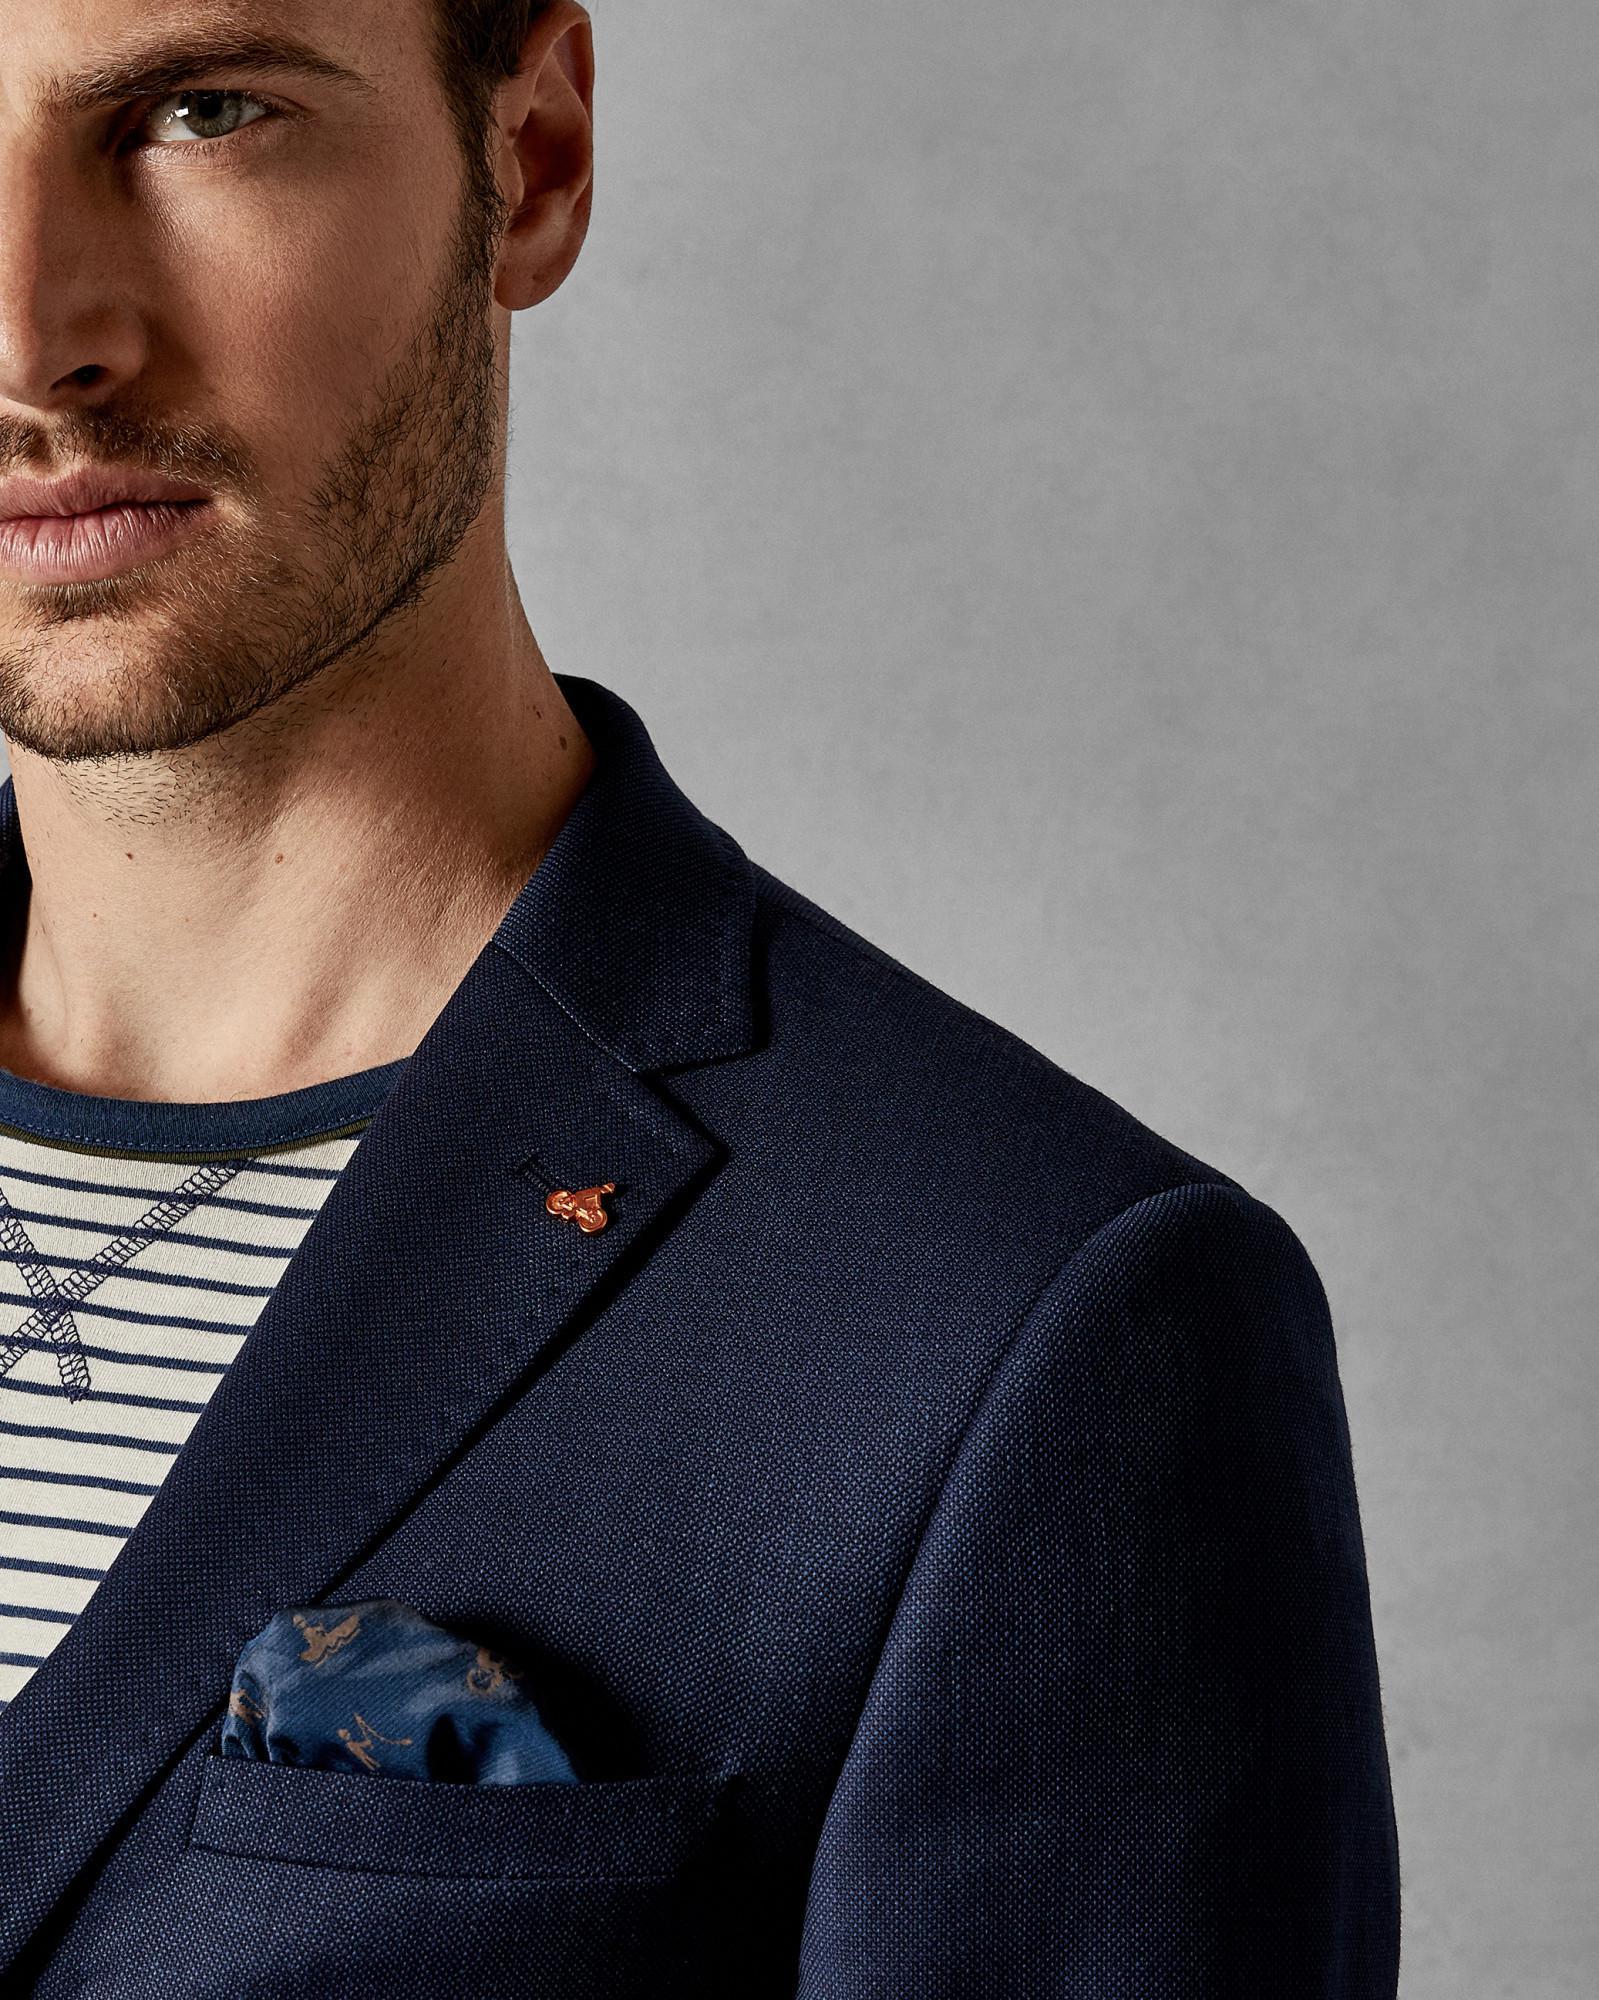 ec8cb9e16 Ted Baker Endurance Birdseye Wool Performance Suit Jacket in Blue for Men -  Lyst